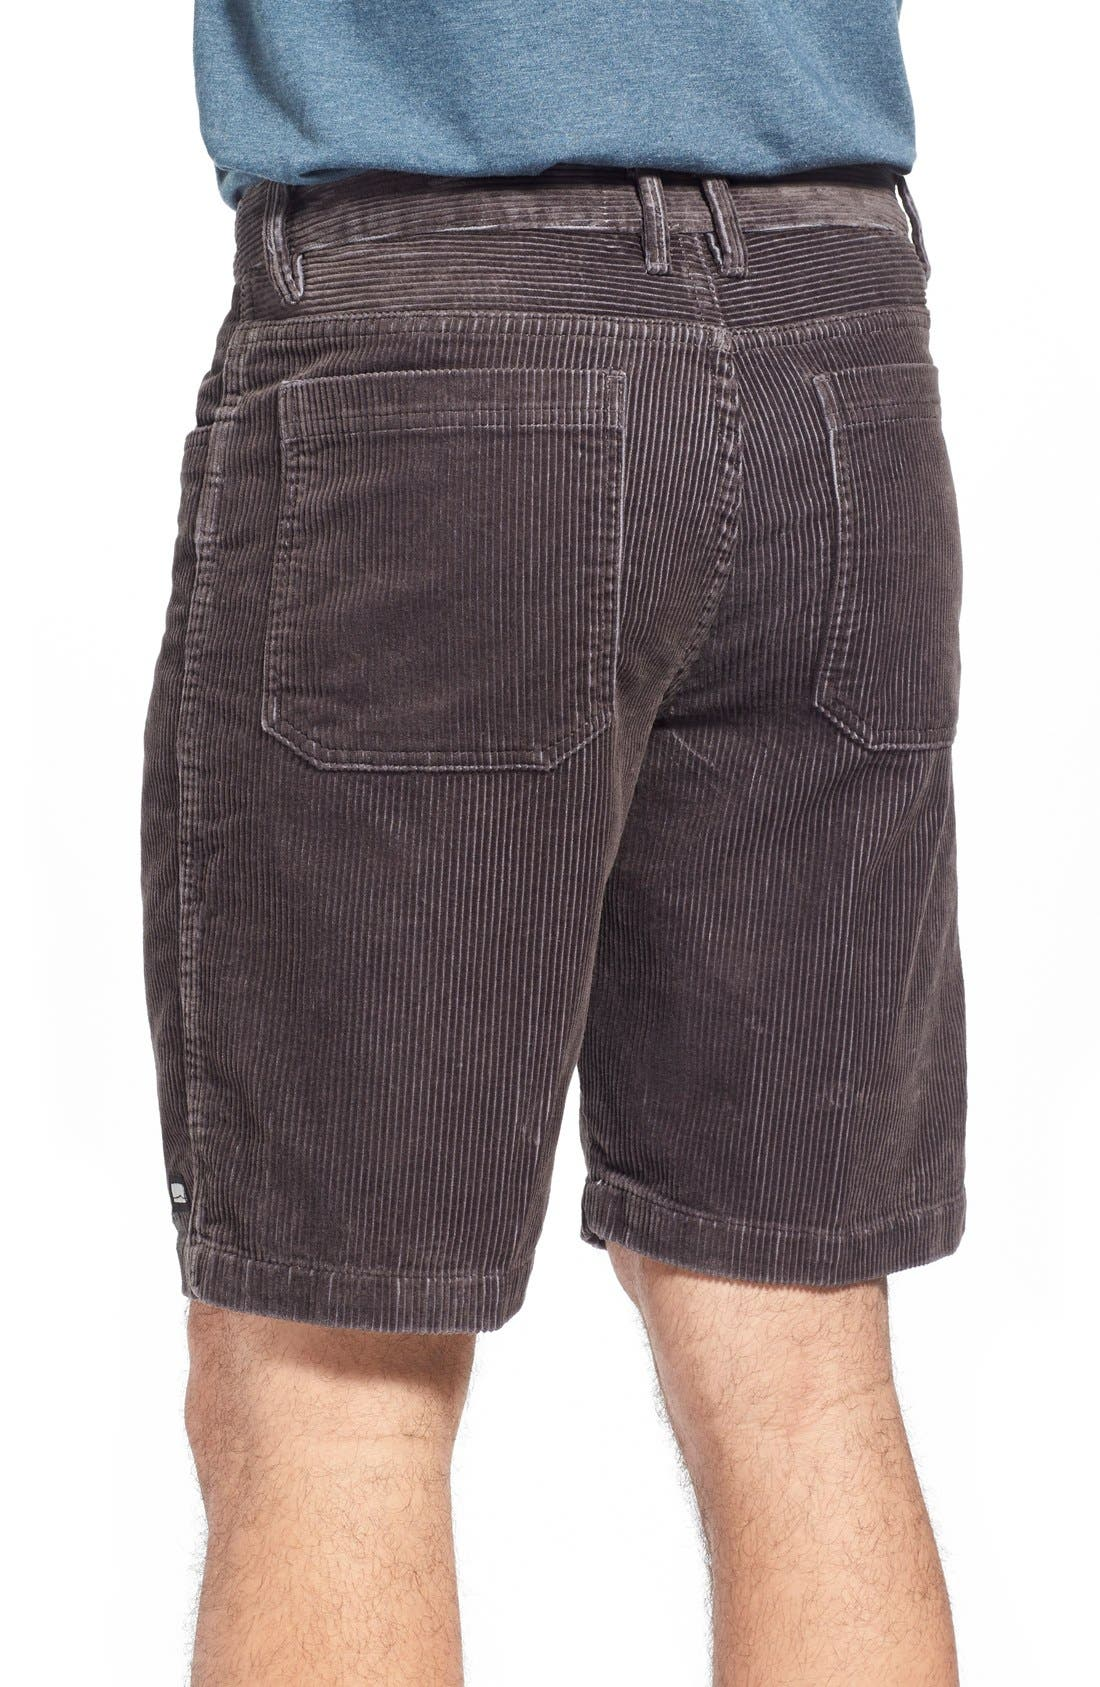 Kordo Corduroy Walking Shorts,                             Alternate thumbnail 15, color,